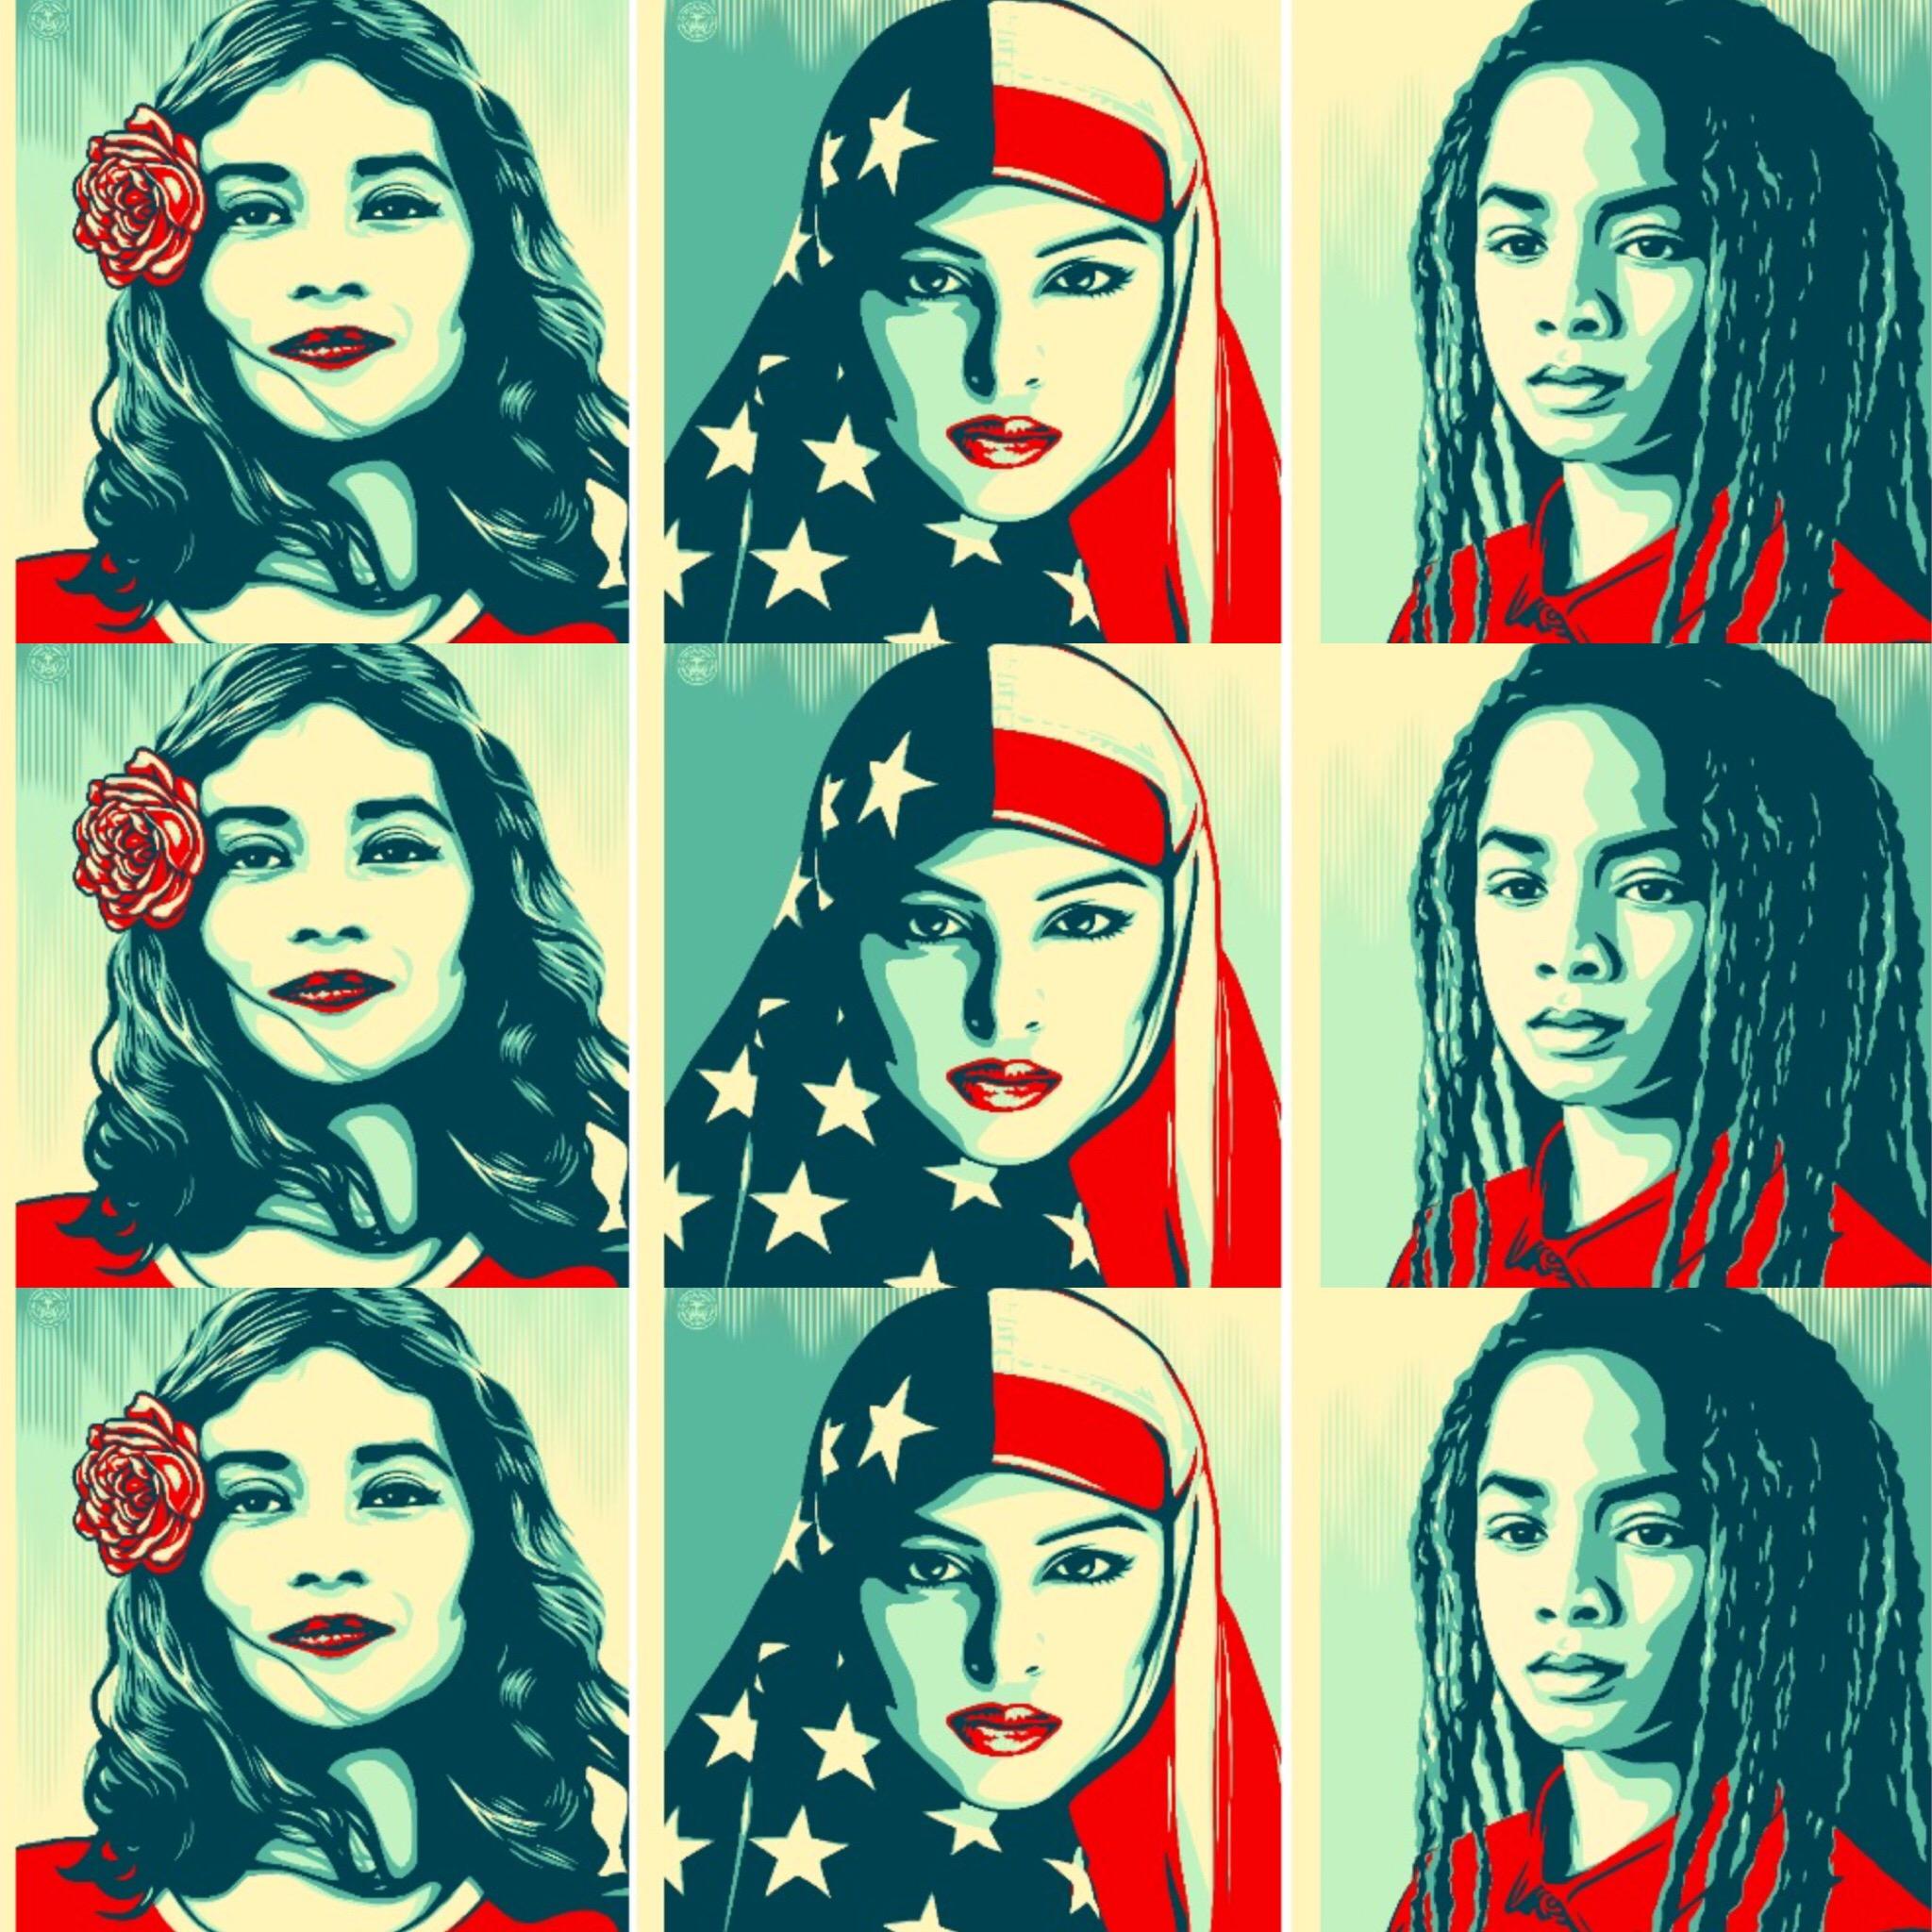 We the People/Shepard Fairey